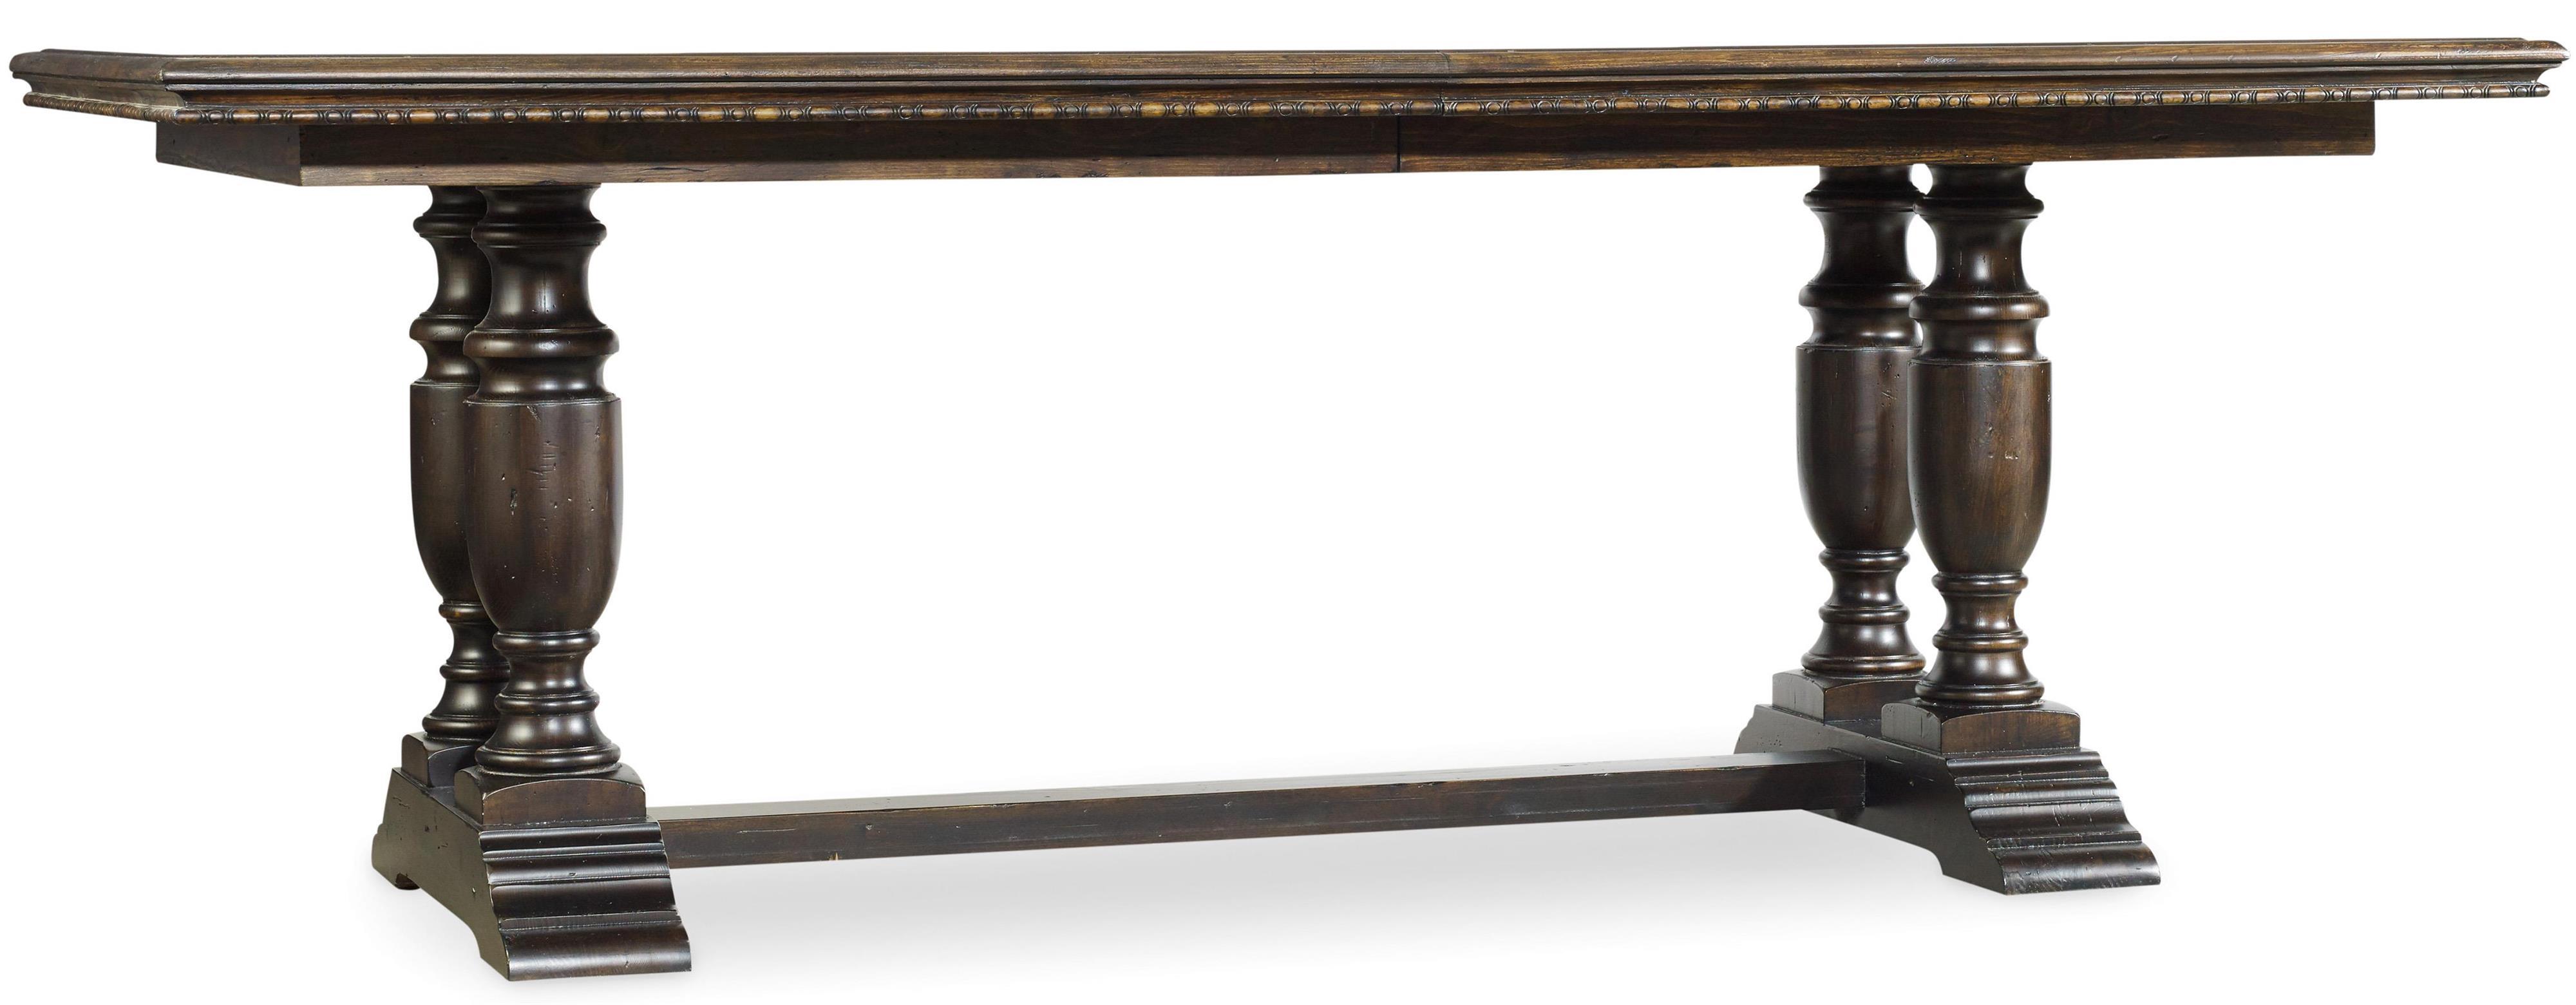 Treviso Trestle Dining Table by Hooker Furniture at Baer's Furniture